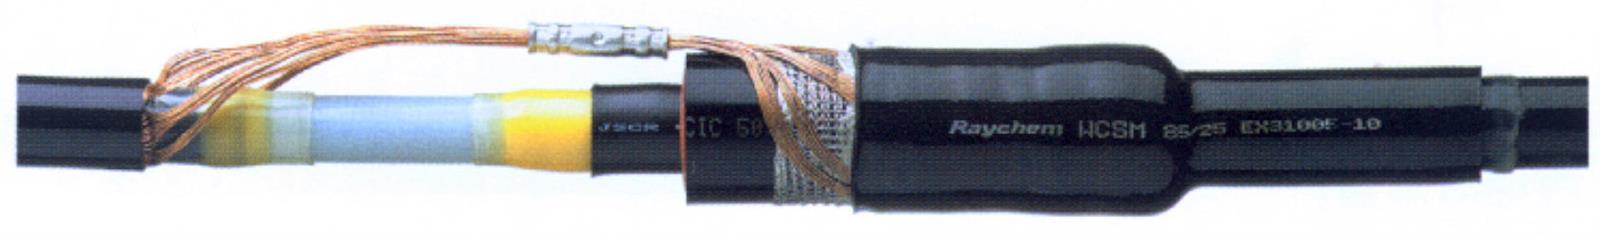 KABELSKARV SXSU-3111